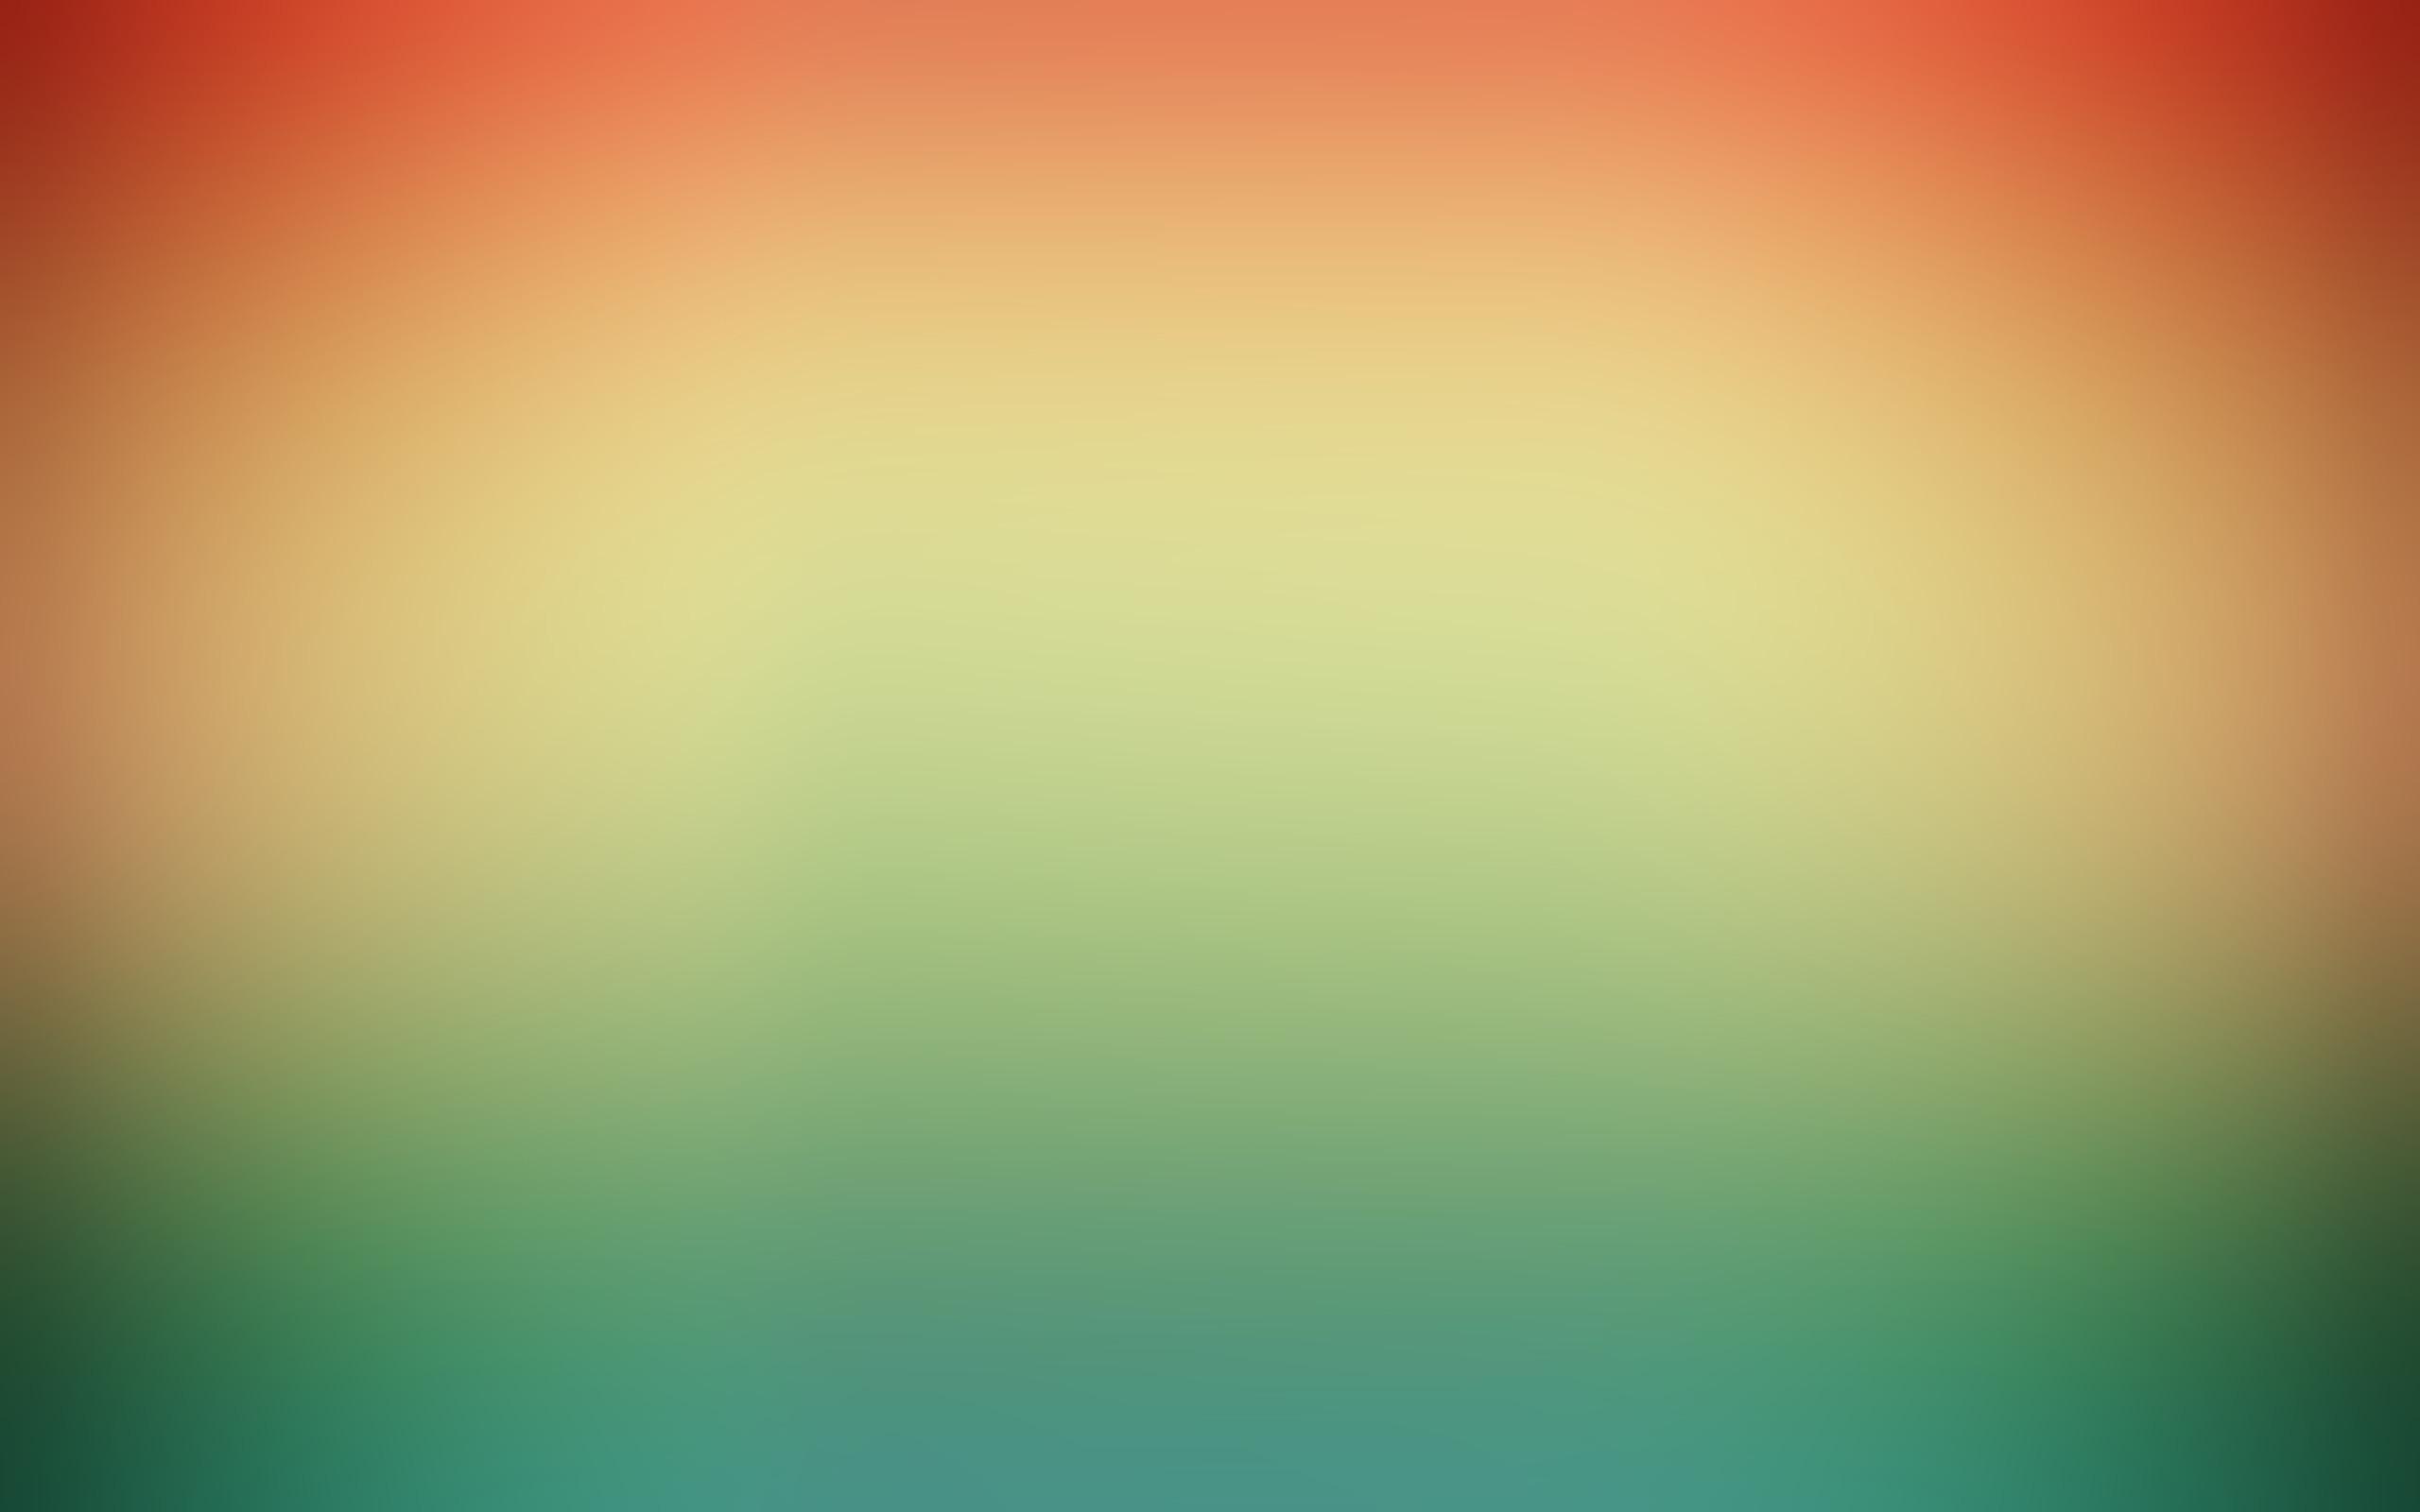 Soft Color Wallpaper (43+ images)